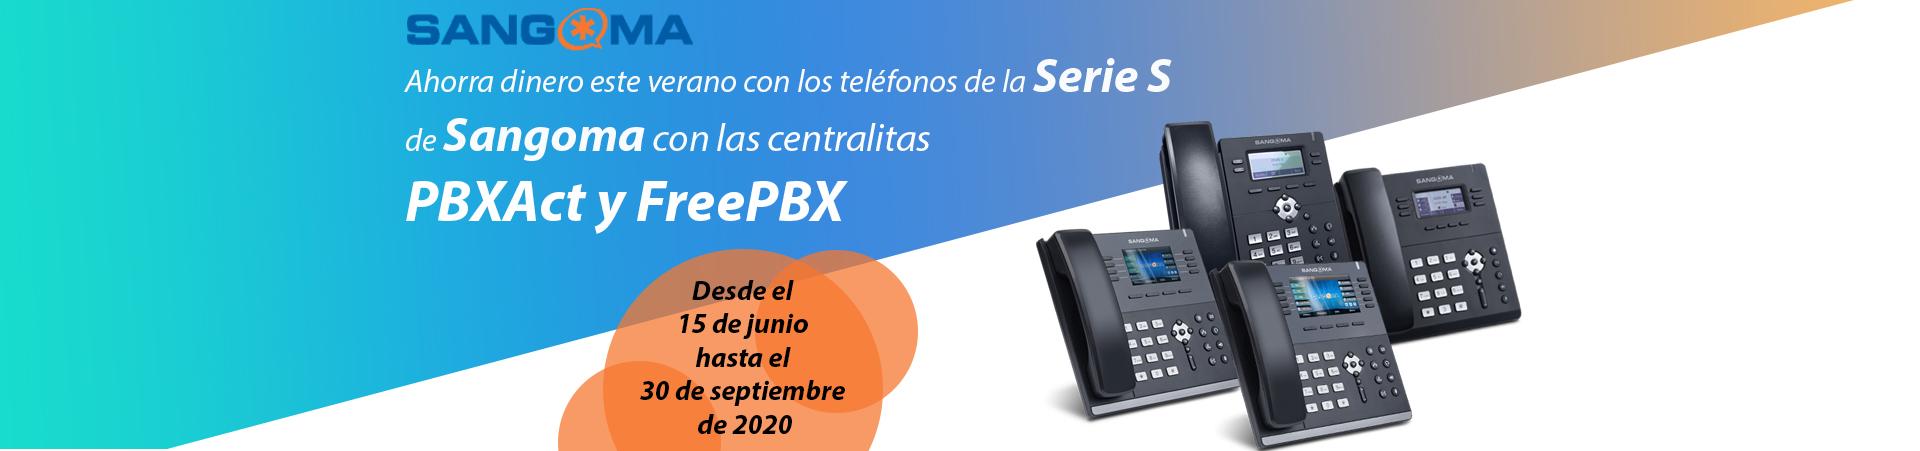 Sangoma Serie S PBXact FrePBX